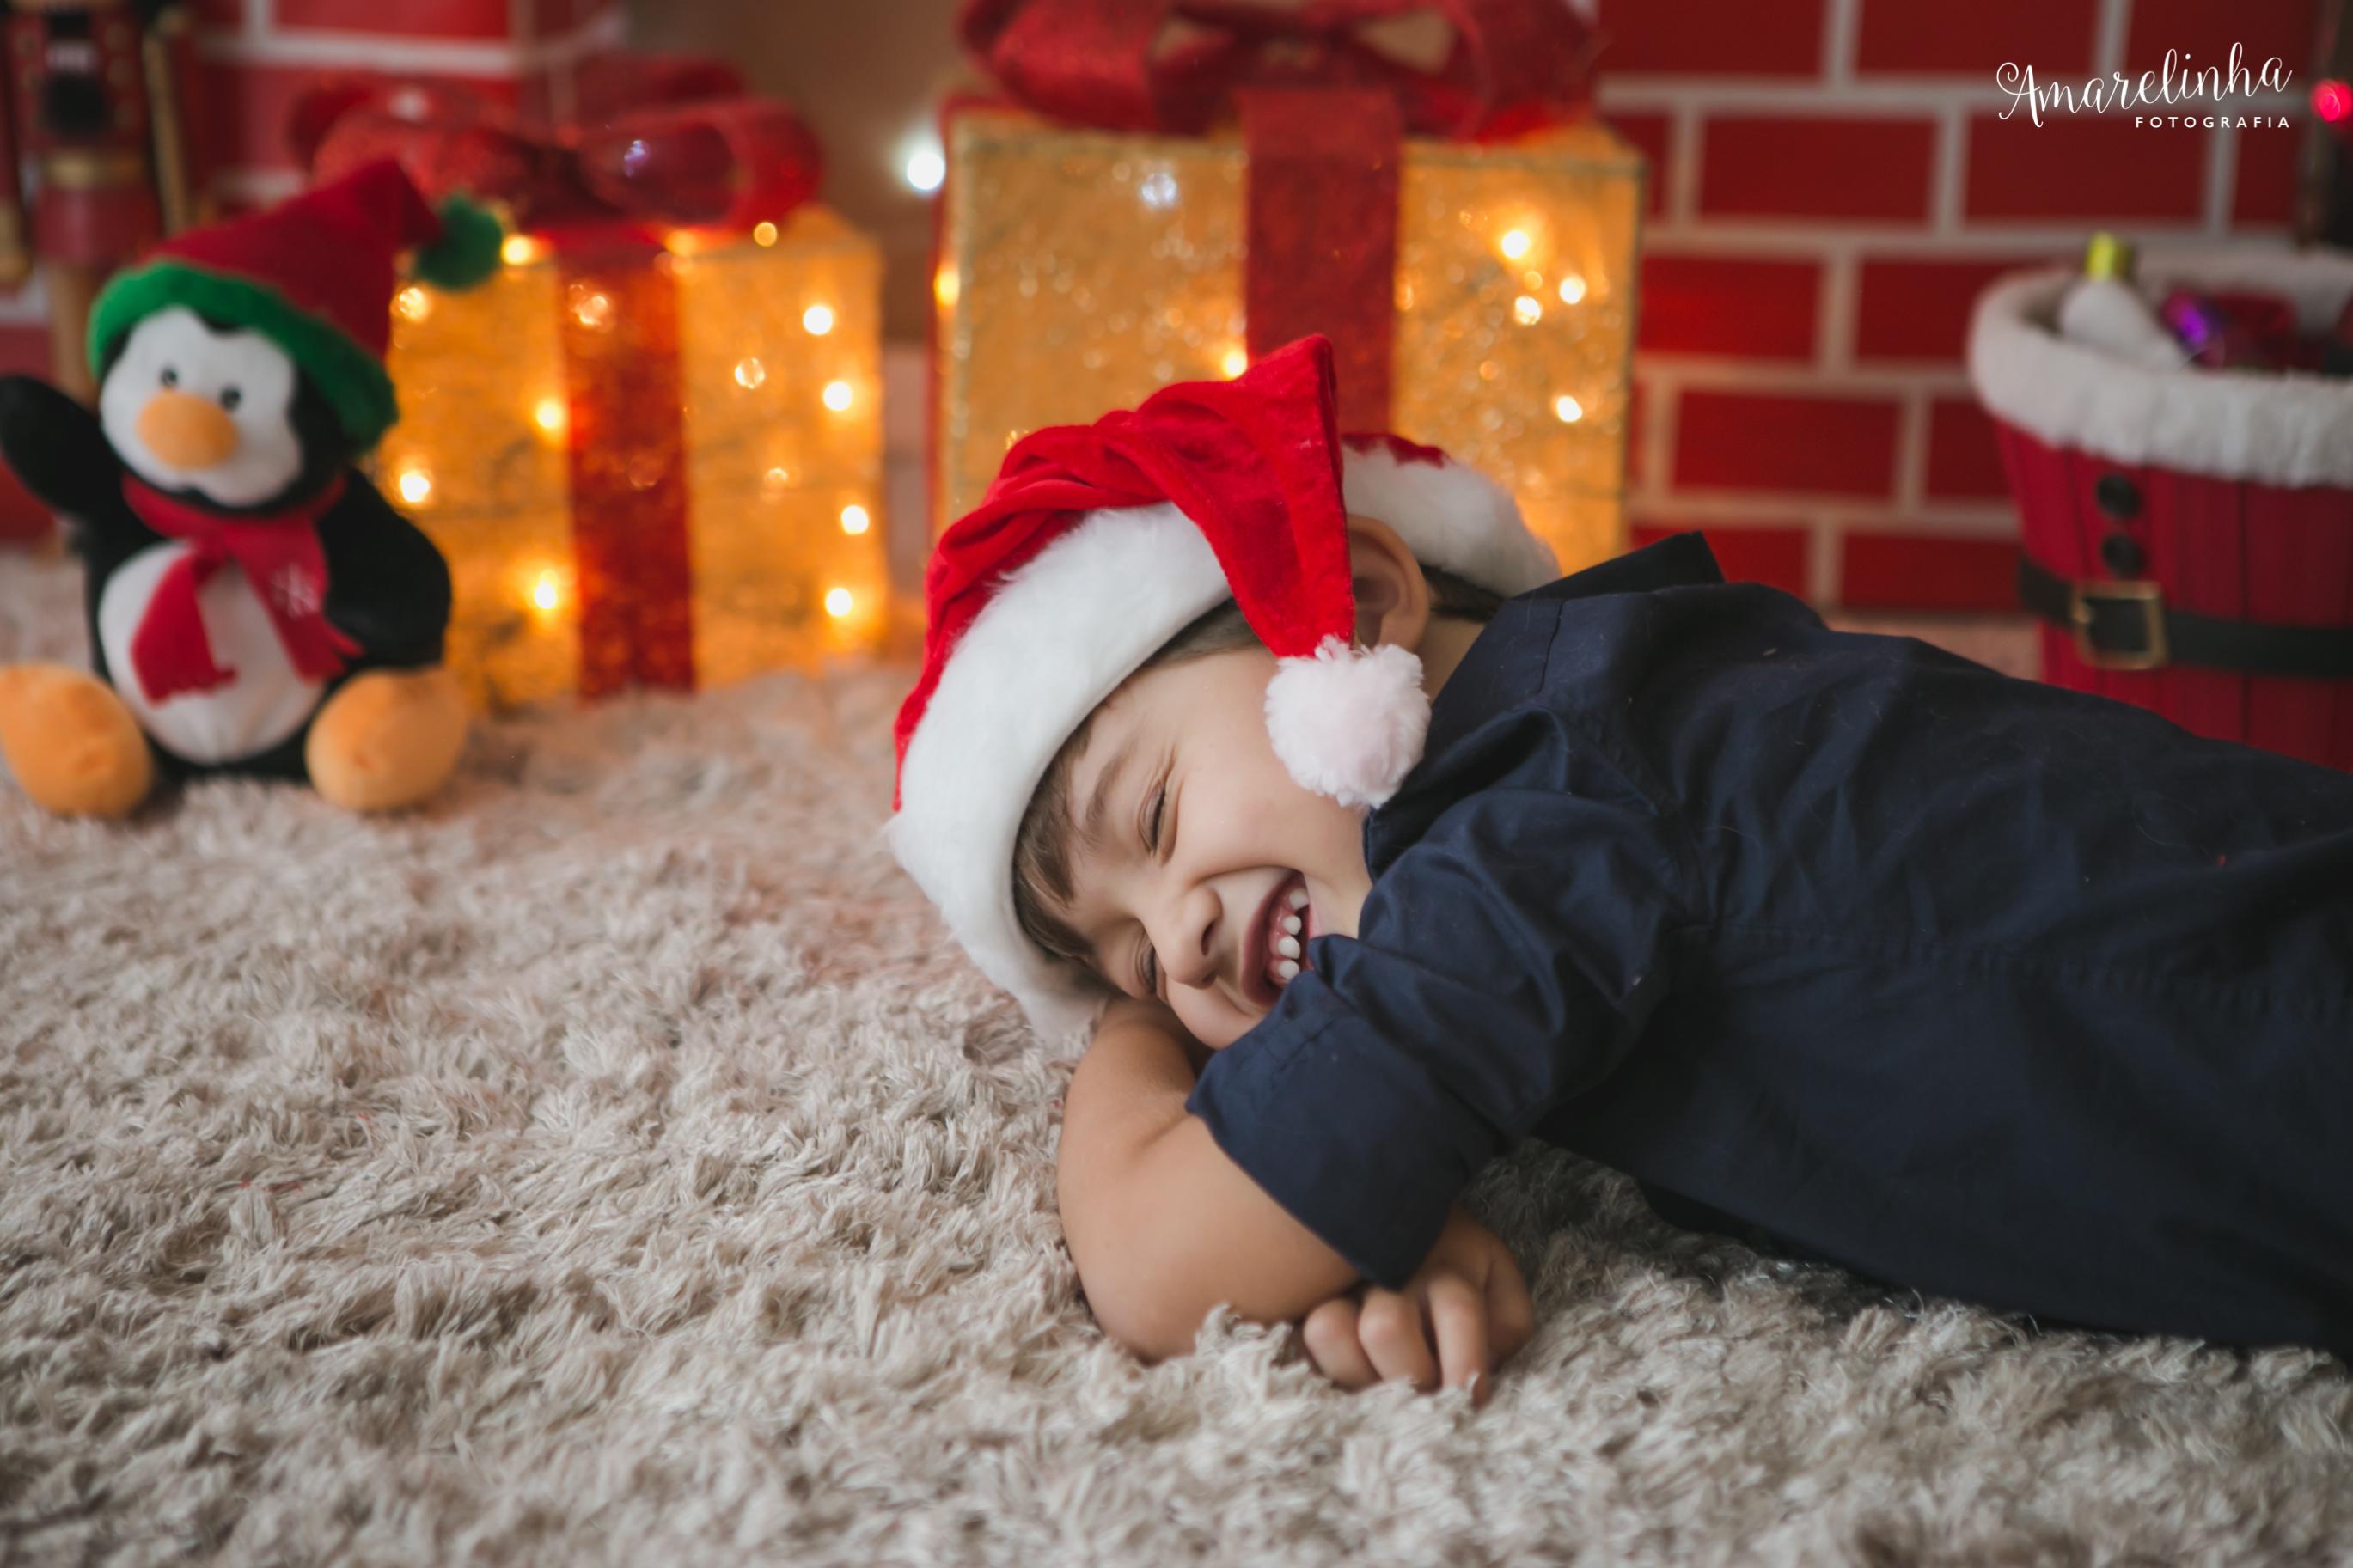 amarelinha-fotografia-mini-ensaio-de-natal-2016-6846